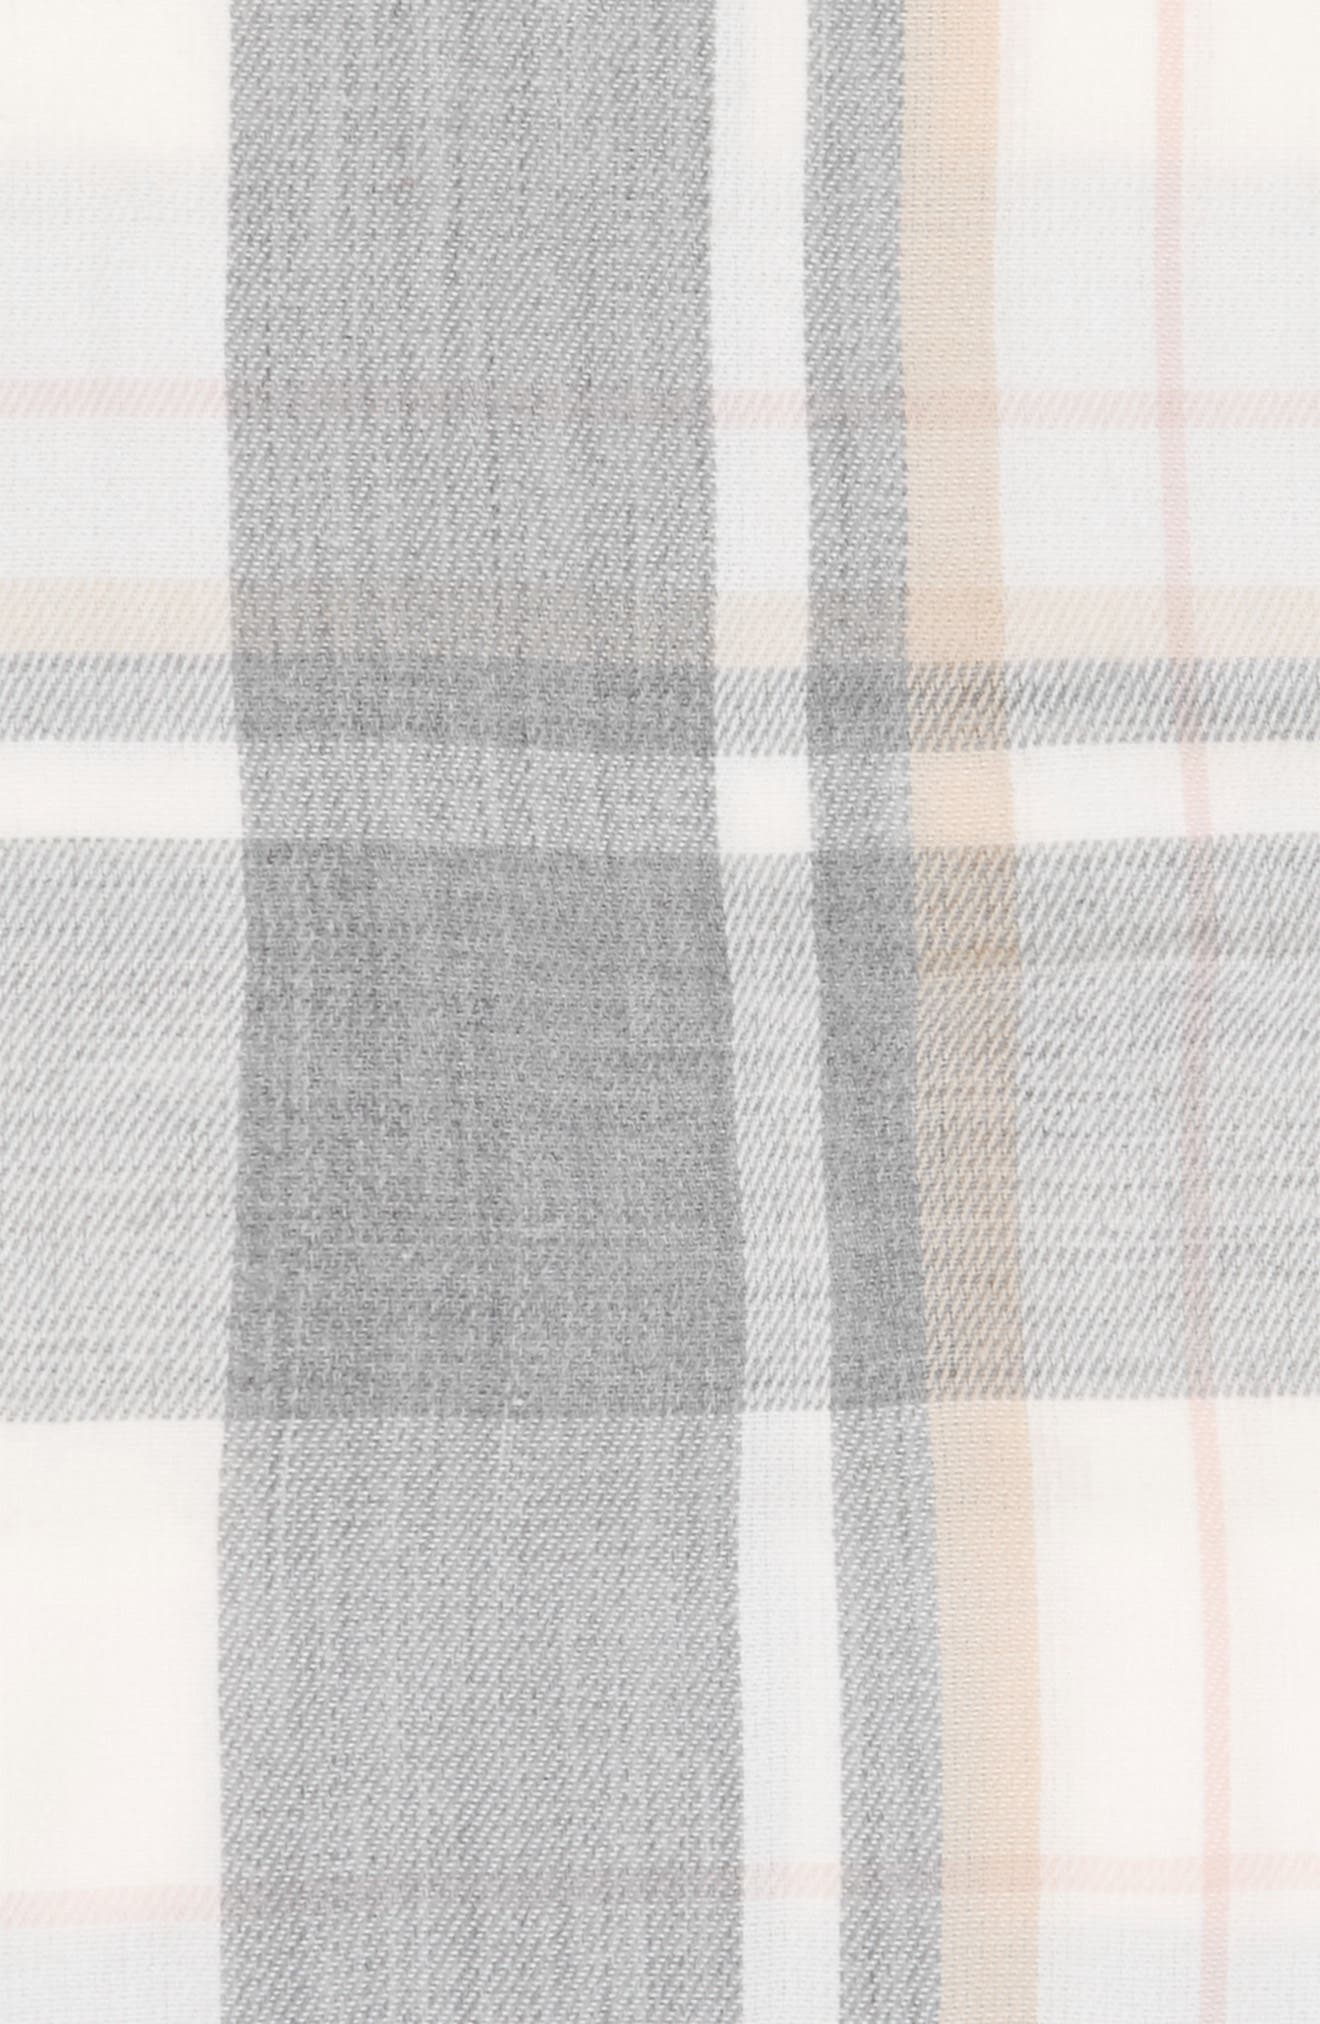 Tonal Plaid Infinity Scarf,                             Alternate thumbnail 3, color,